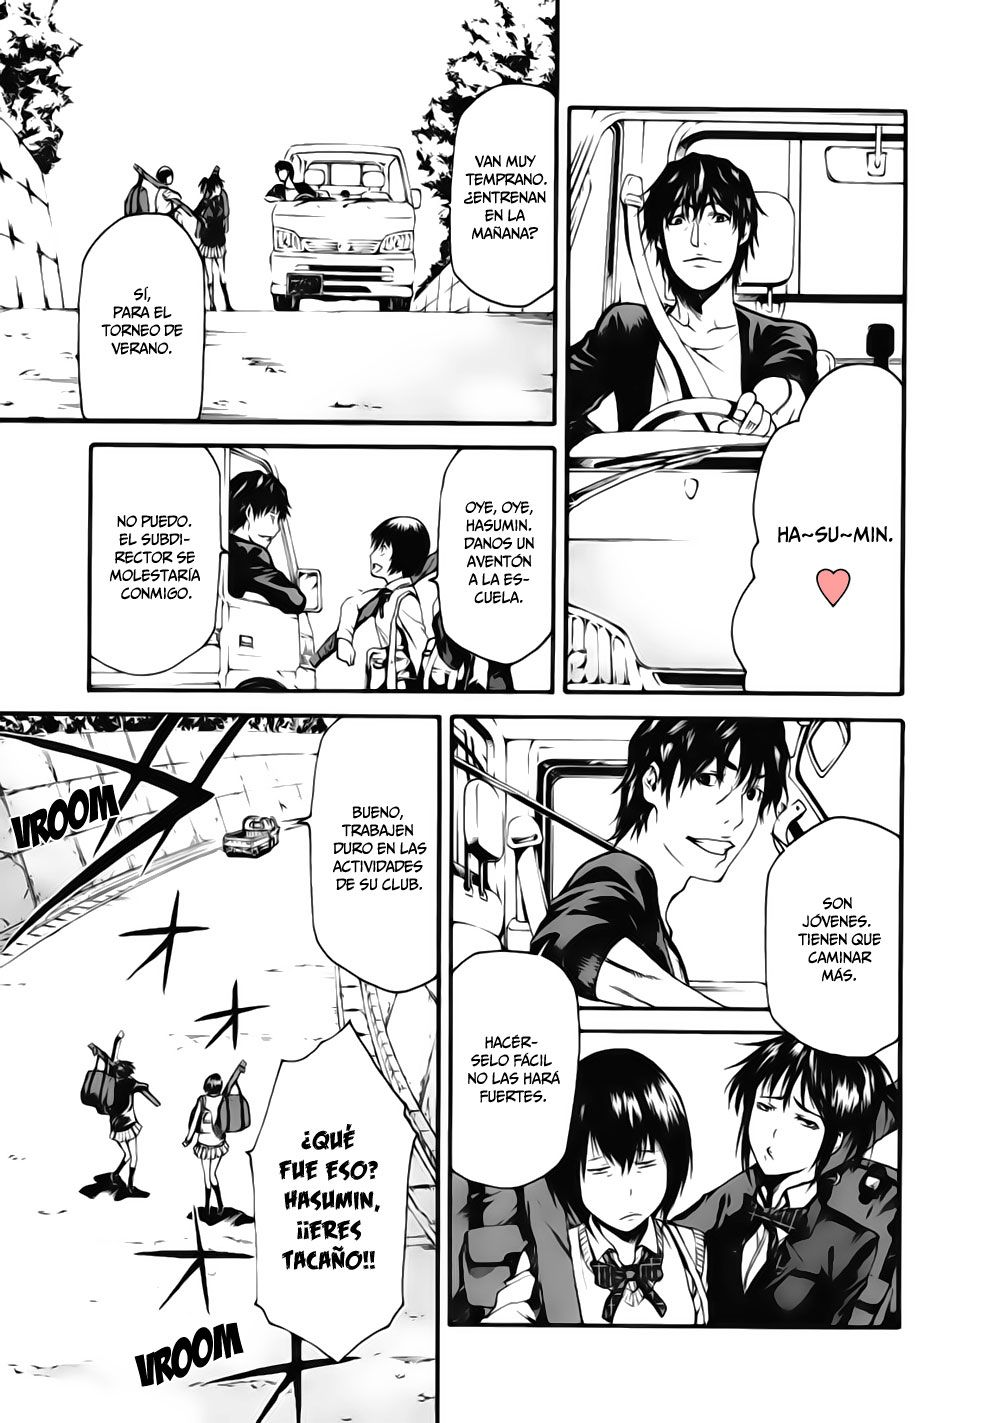 http://c5.ninemanga.com/es_manga/3/19523/460596/2f2c8fcf0d0c5fca6b425d66f6649564.jpg Page 9